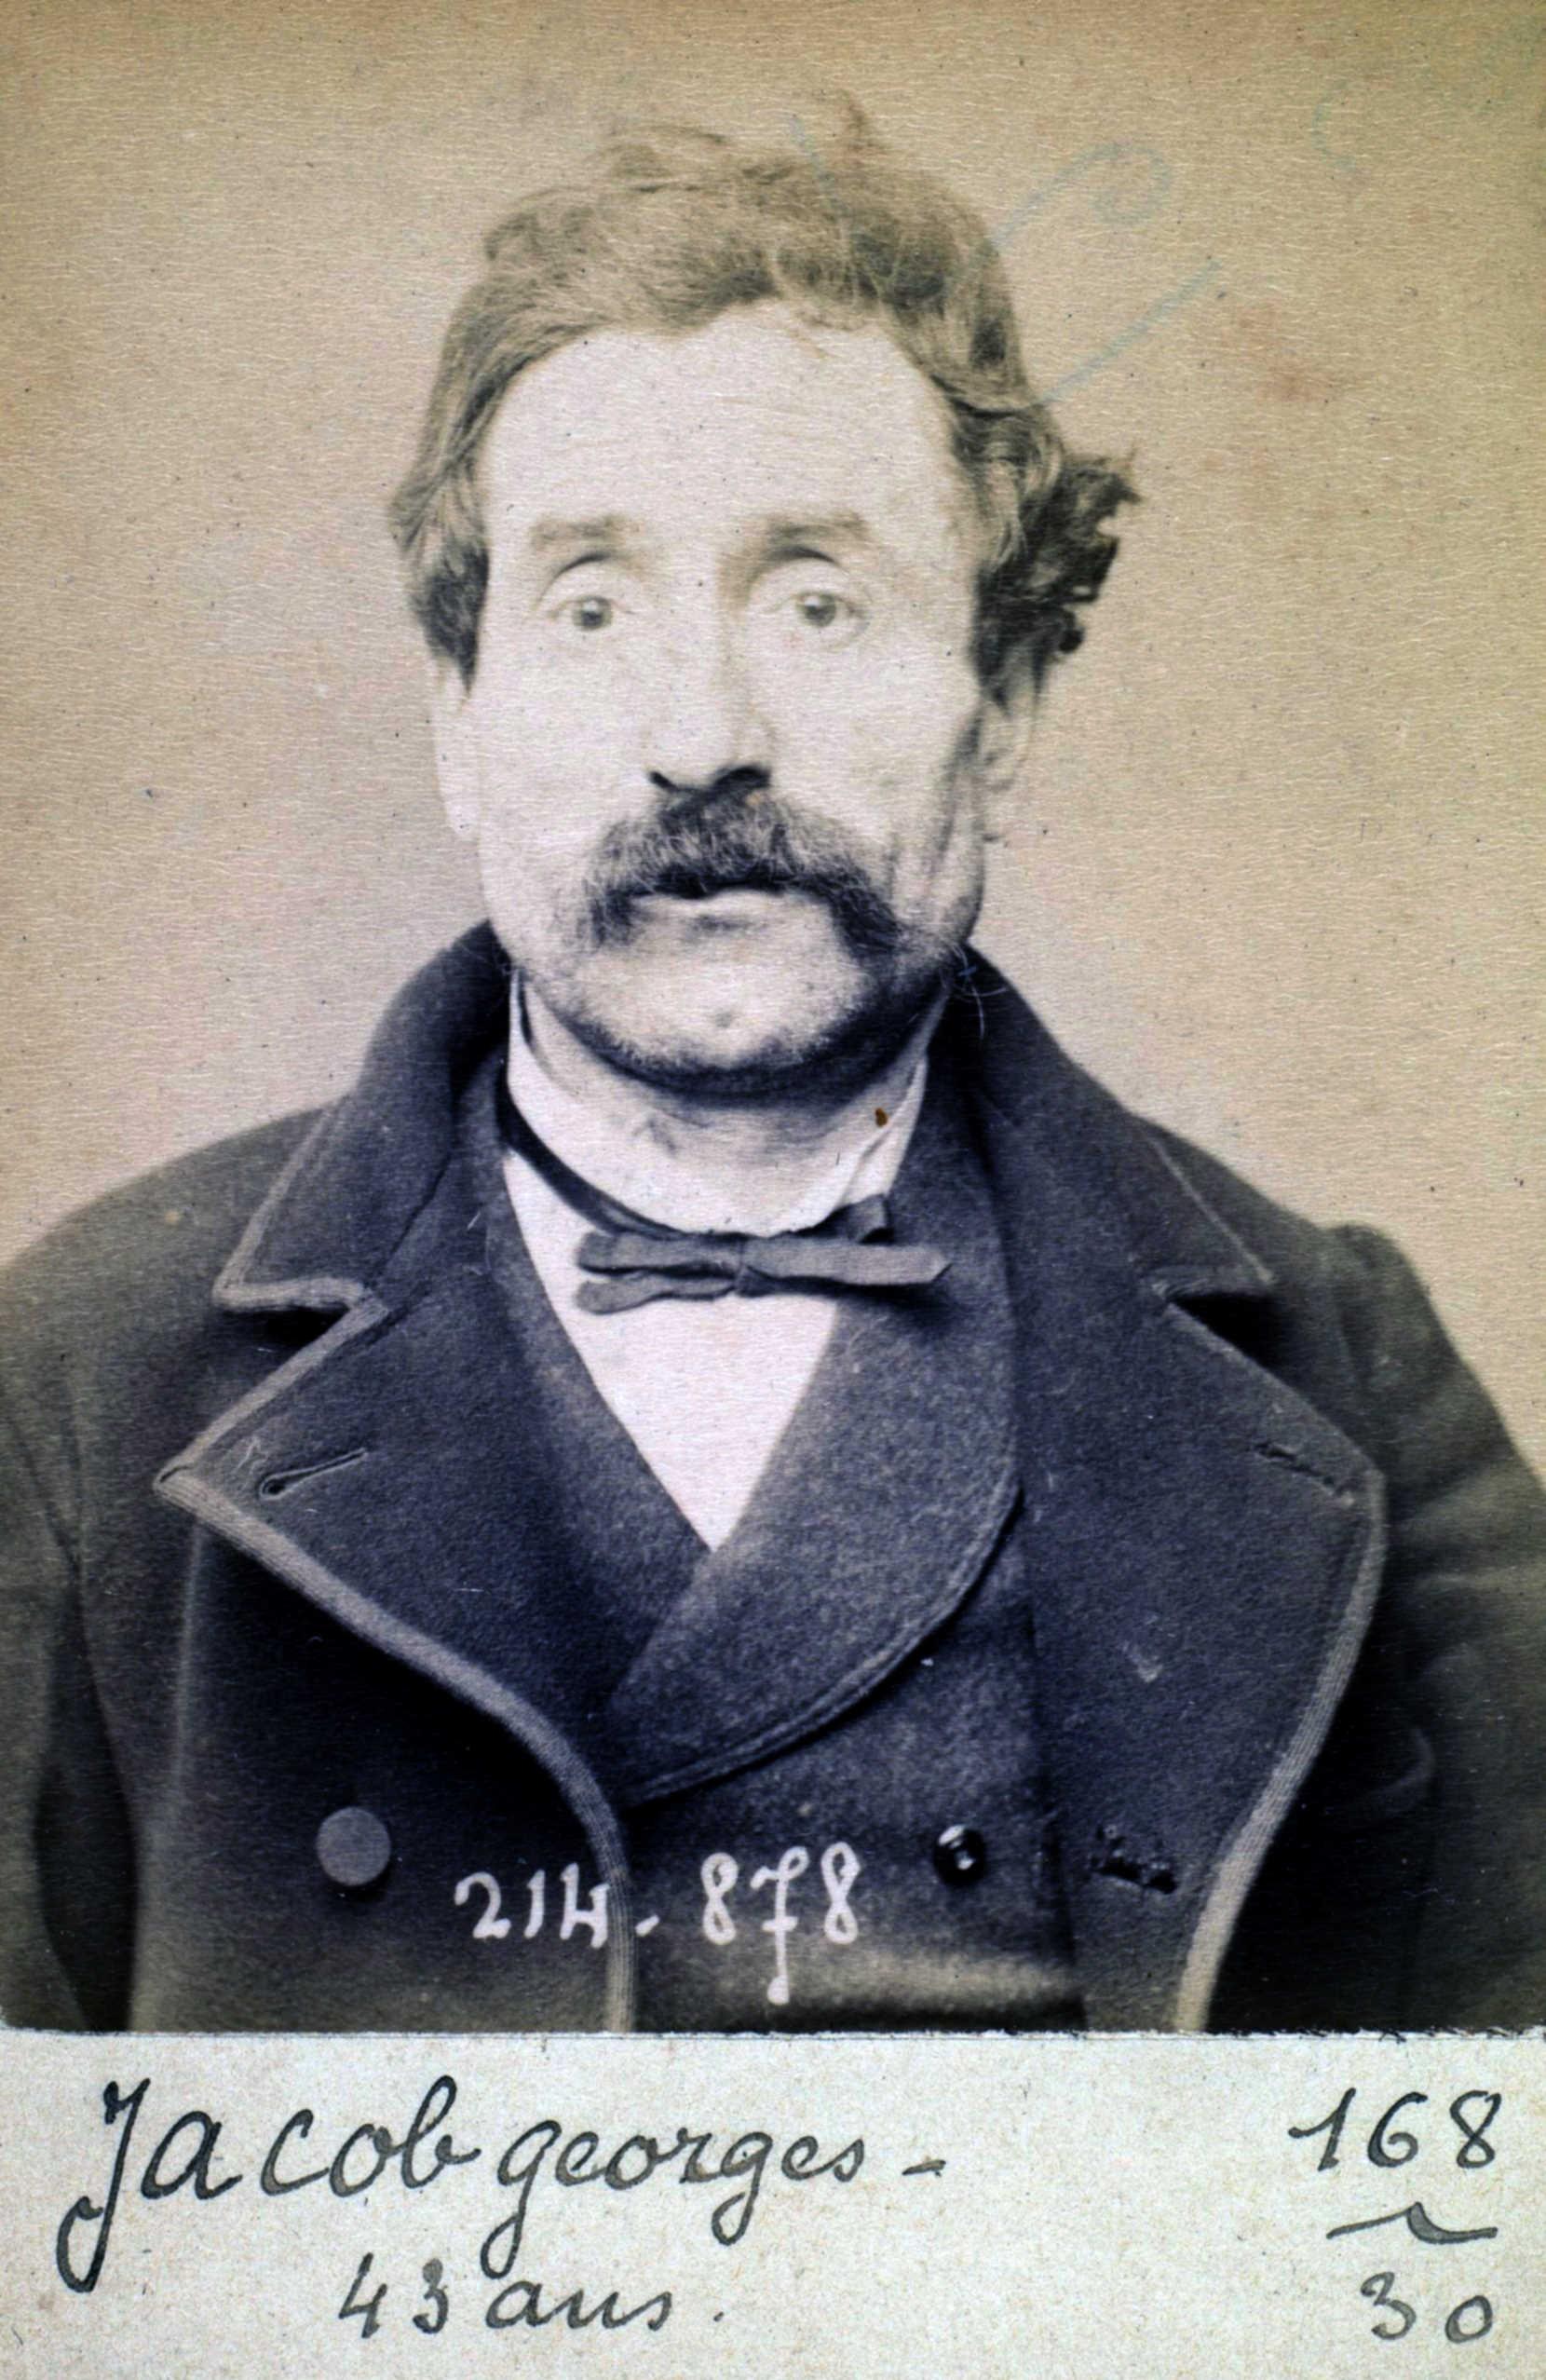 Foto policíaca de Georges Jacob (27 de febrer de 1894)